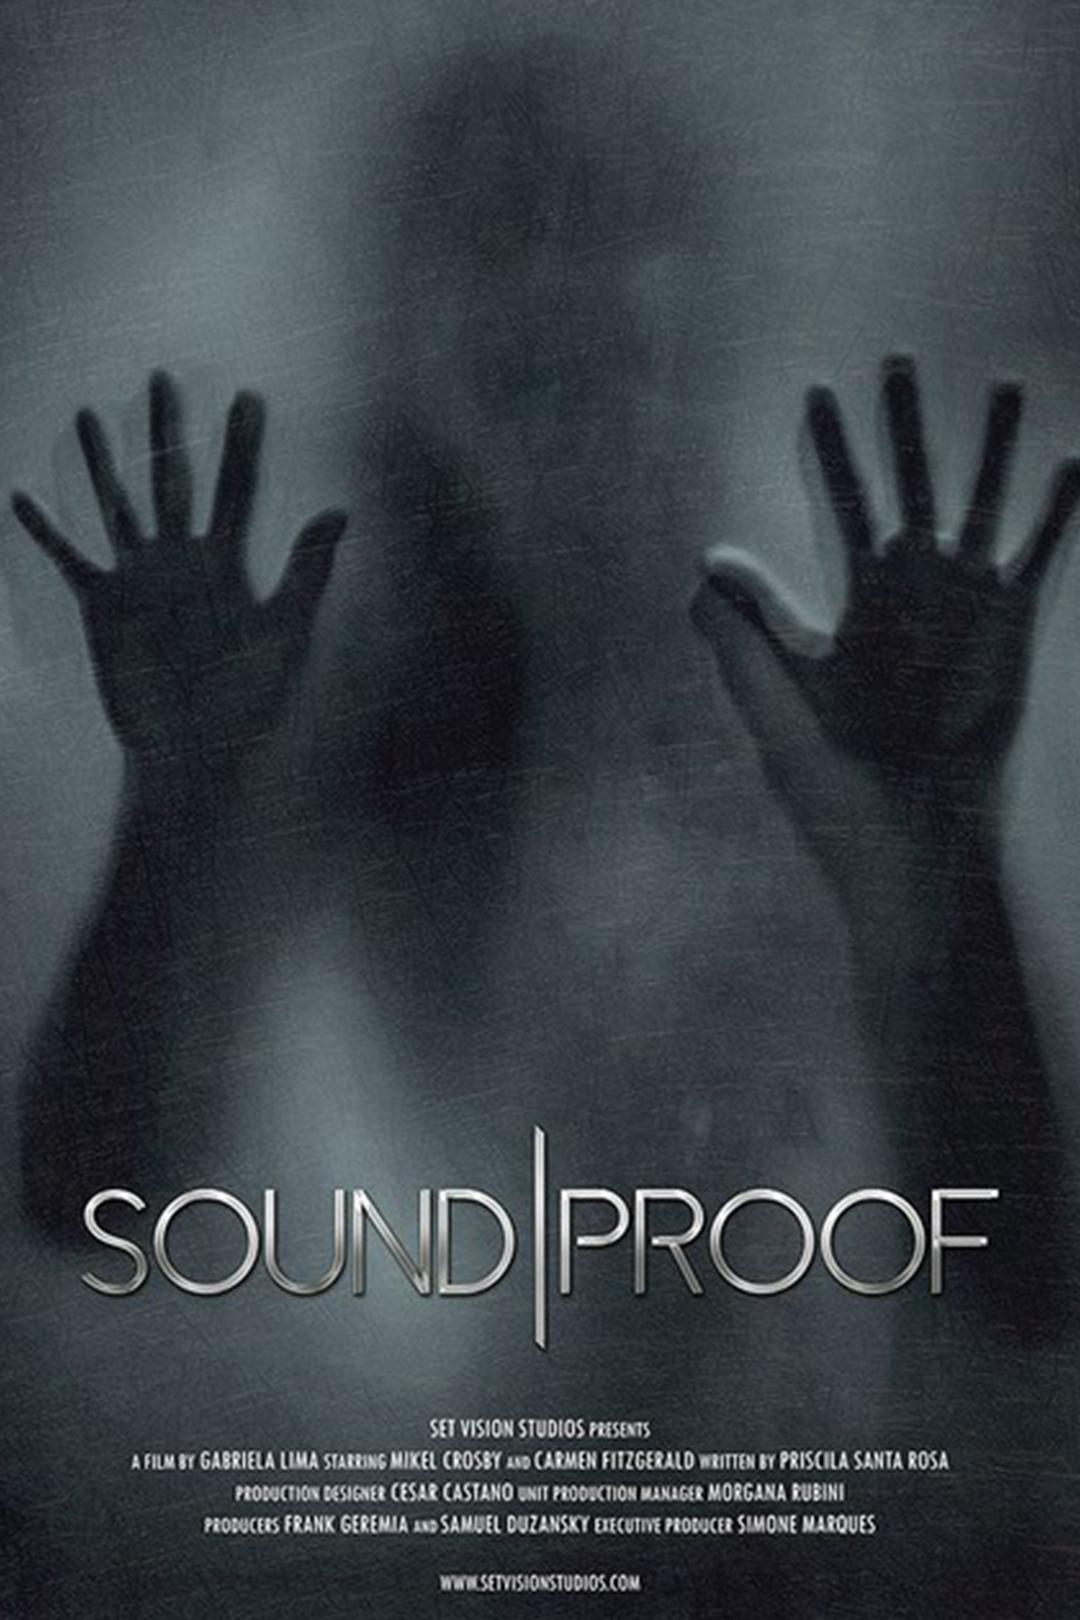 soundproof poster - Gabriela Lima